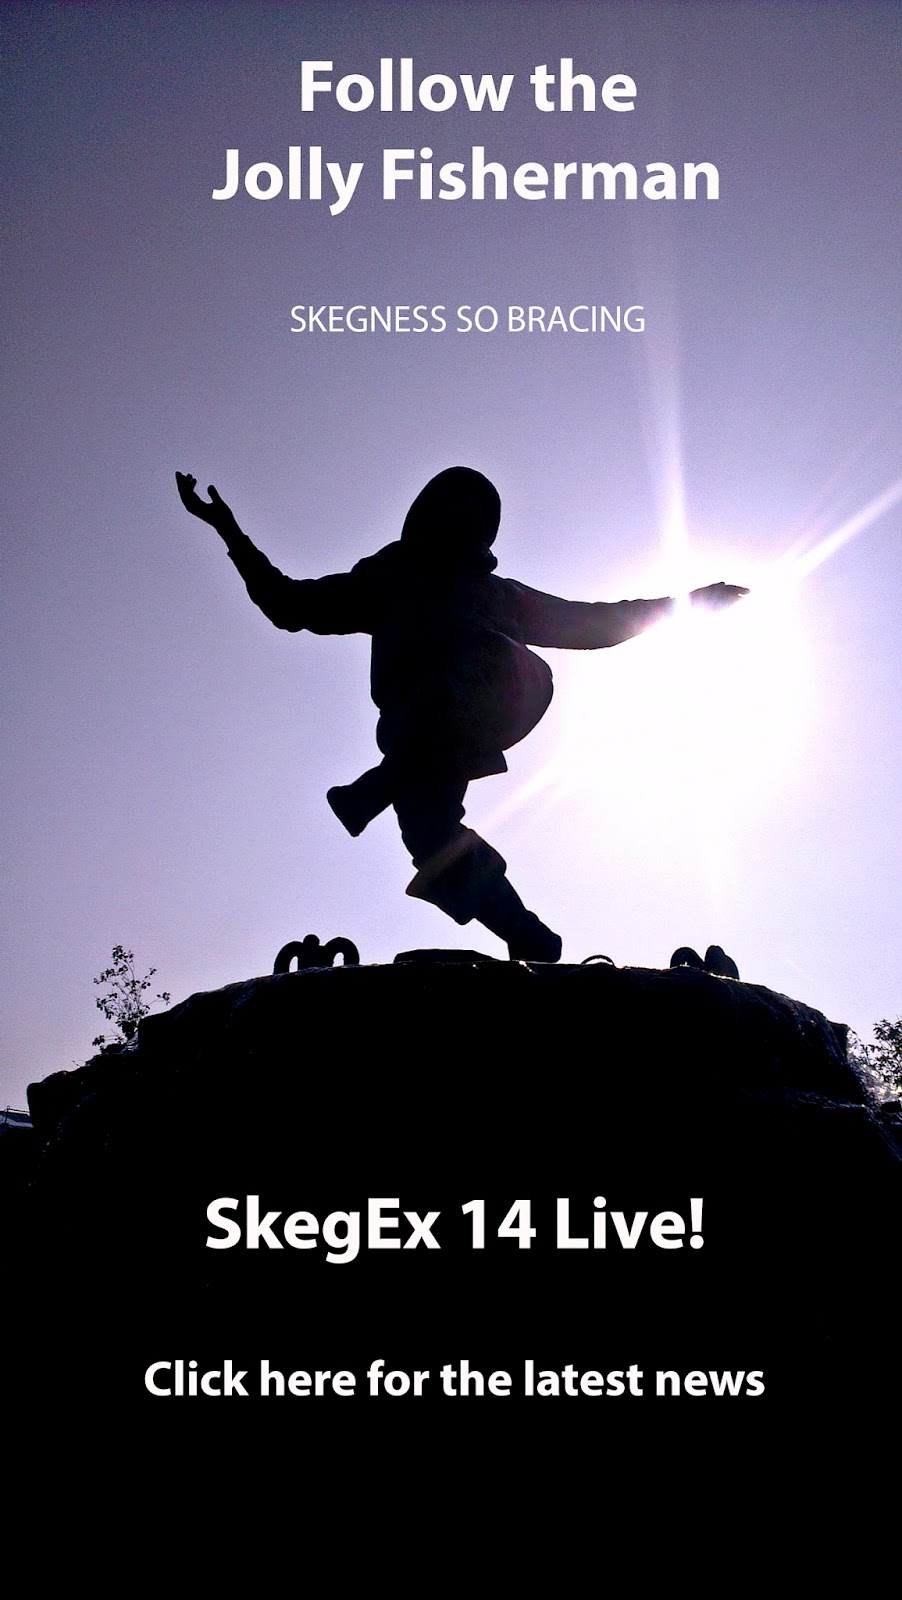 http://my-meccano.blogspot.co.uk/p/skegex-14-live.html